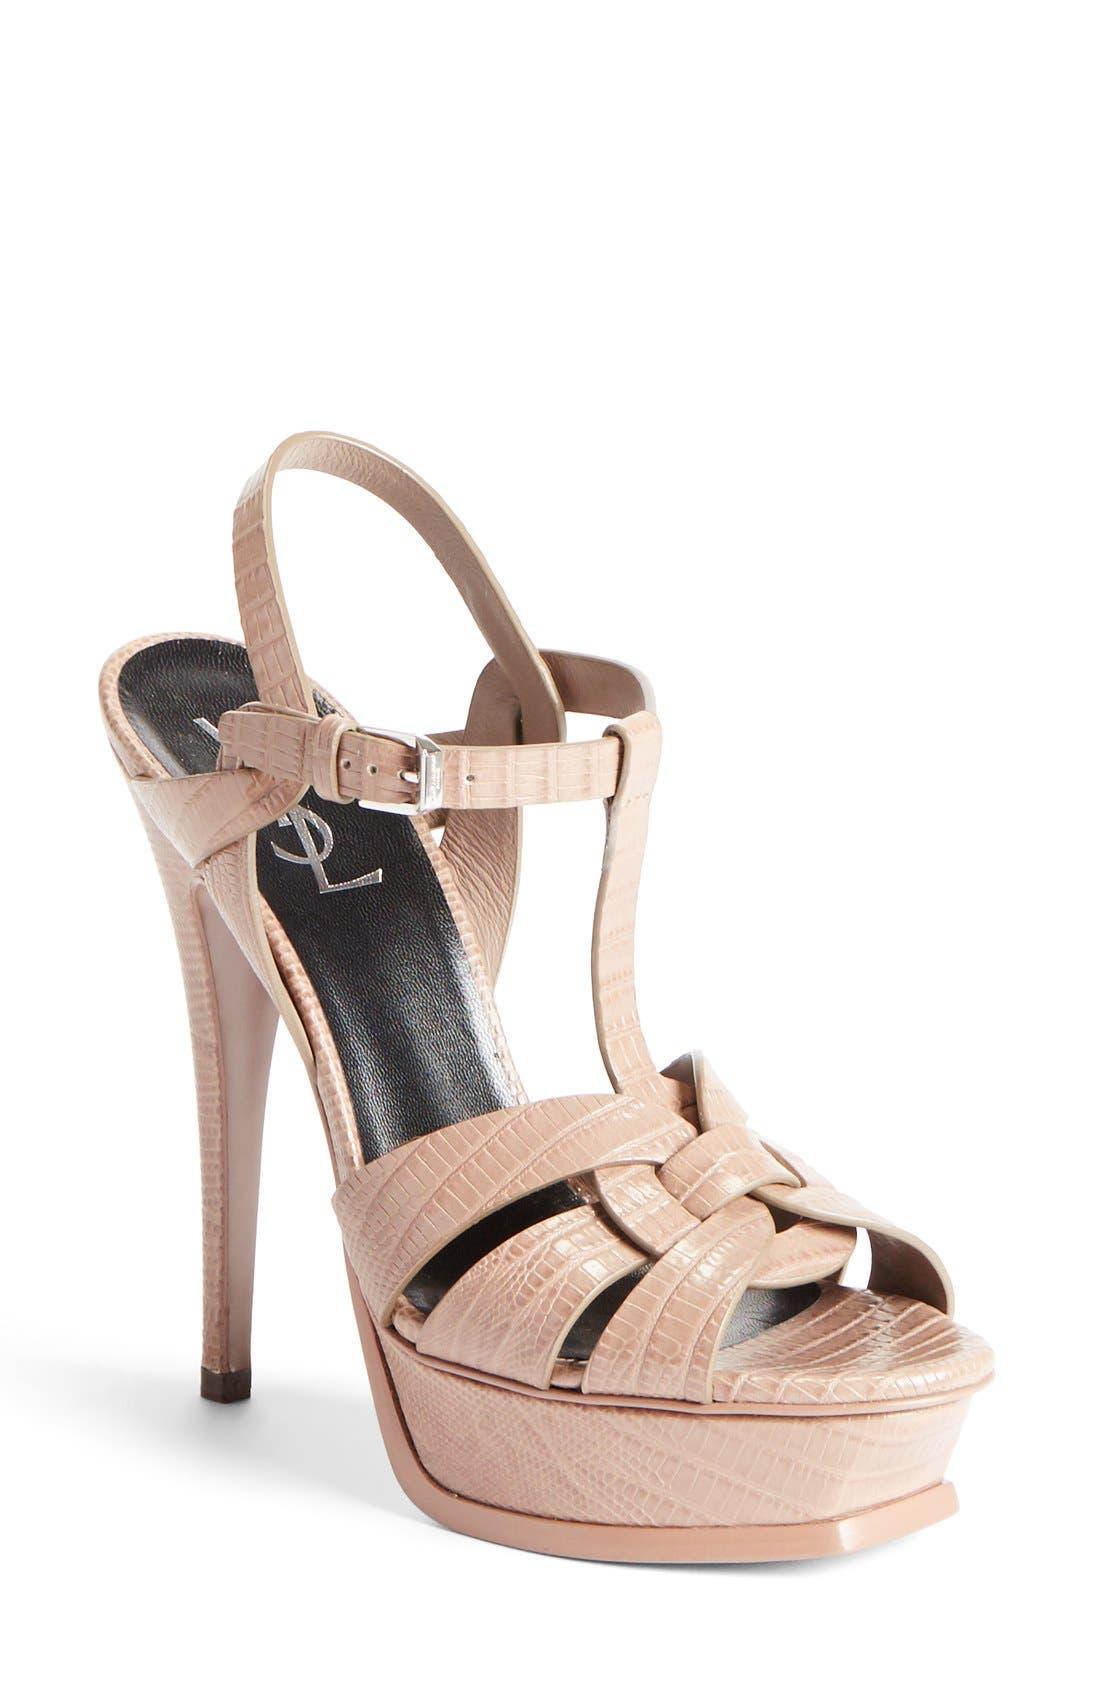 Main Image - Saint Laurent 'Tribute' Sandal (Women)